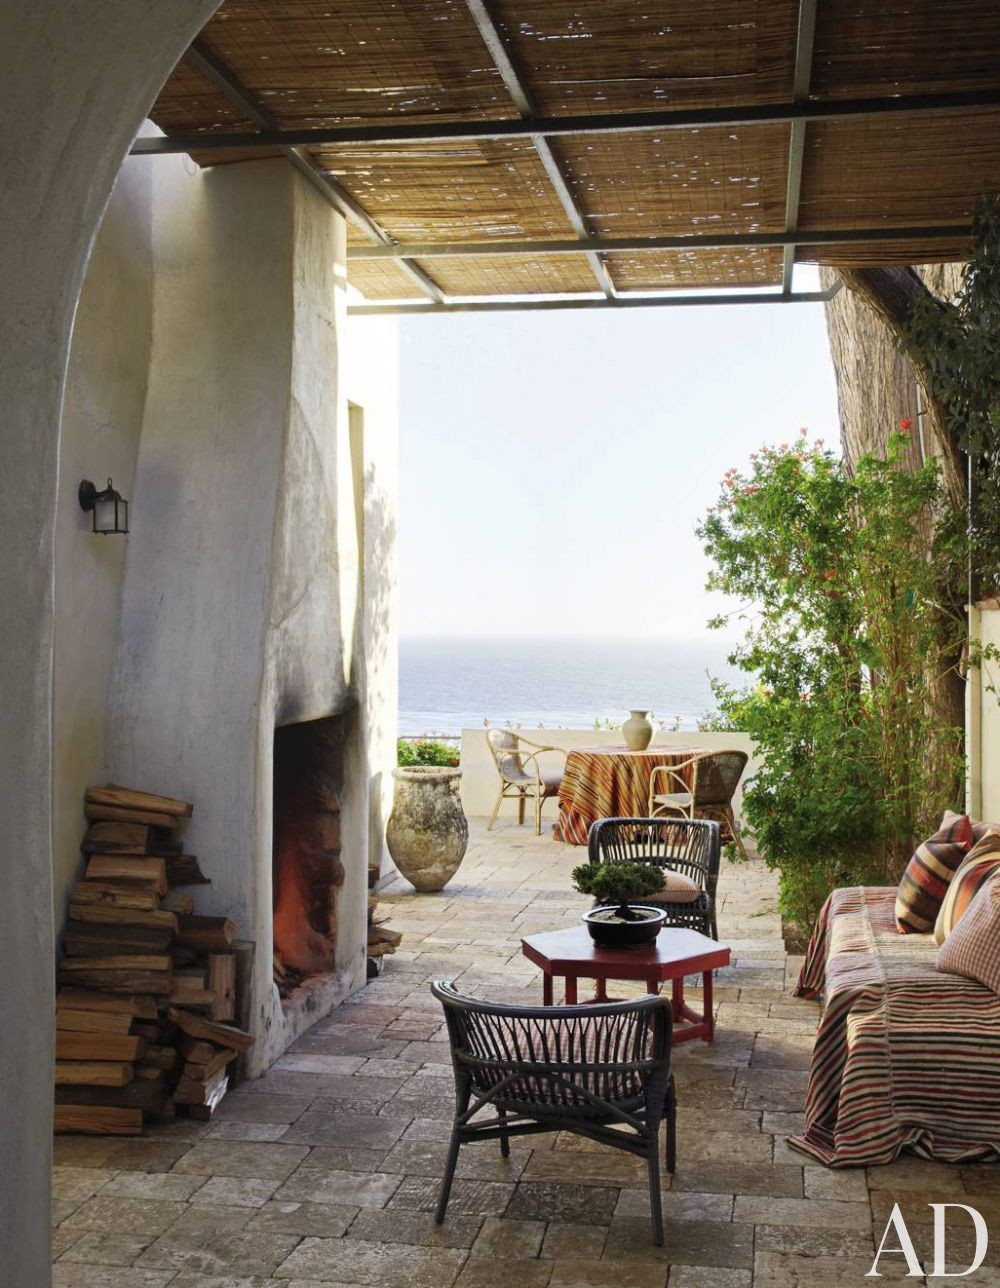 Rustic Outdoor Space by Richard Shapiro and Douglas W. Burdge in Malibu, CA